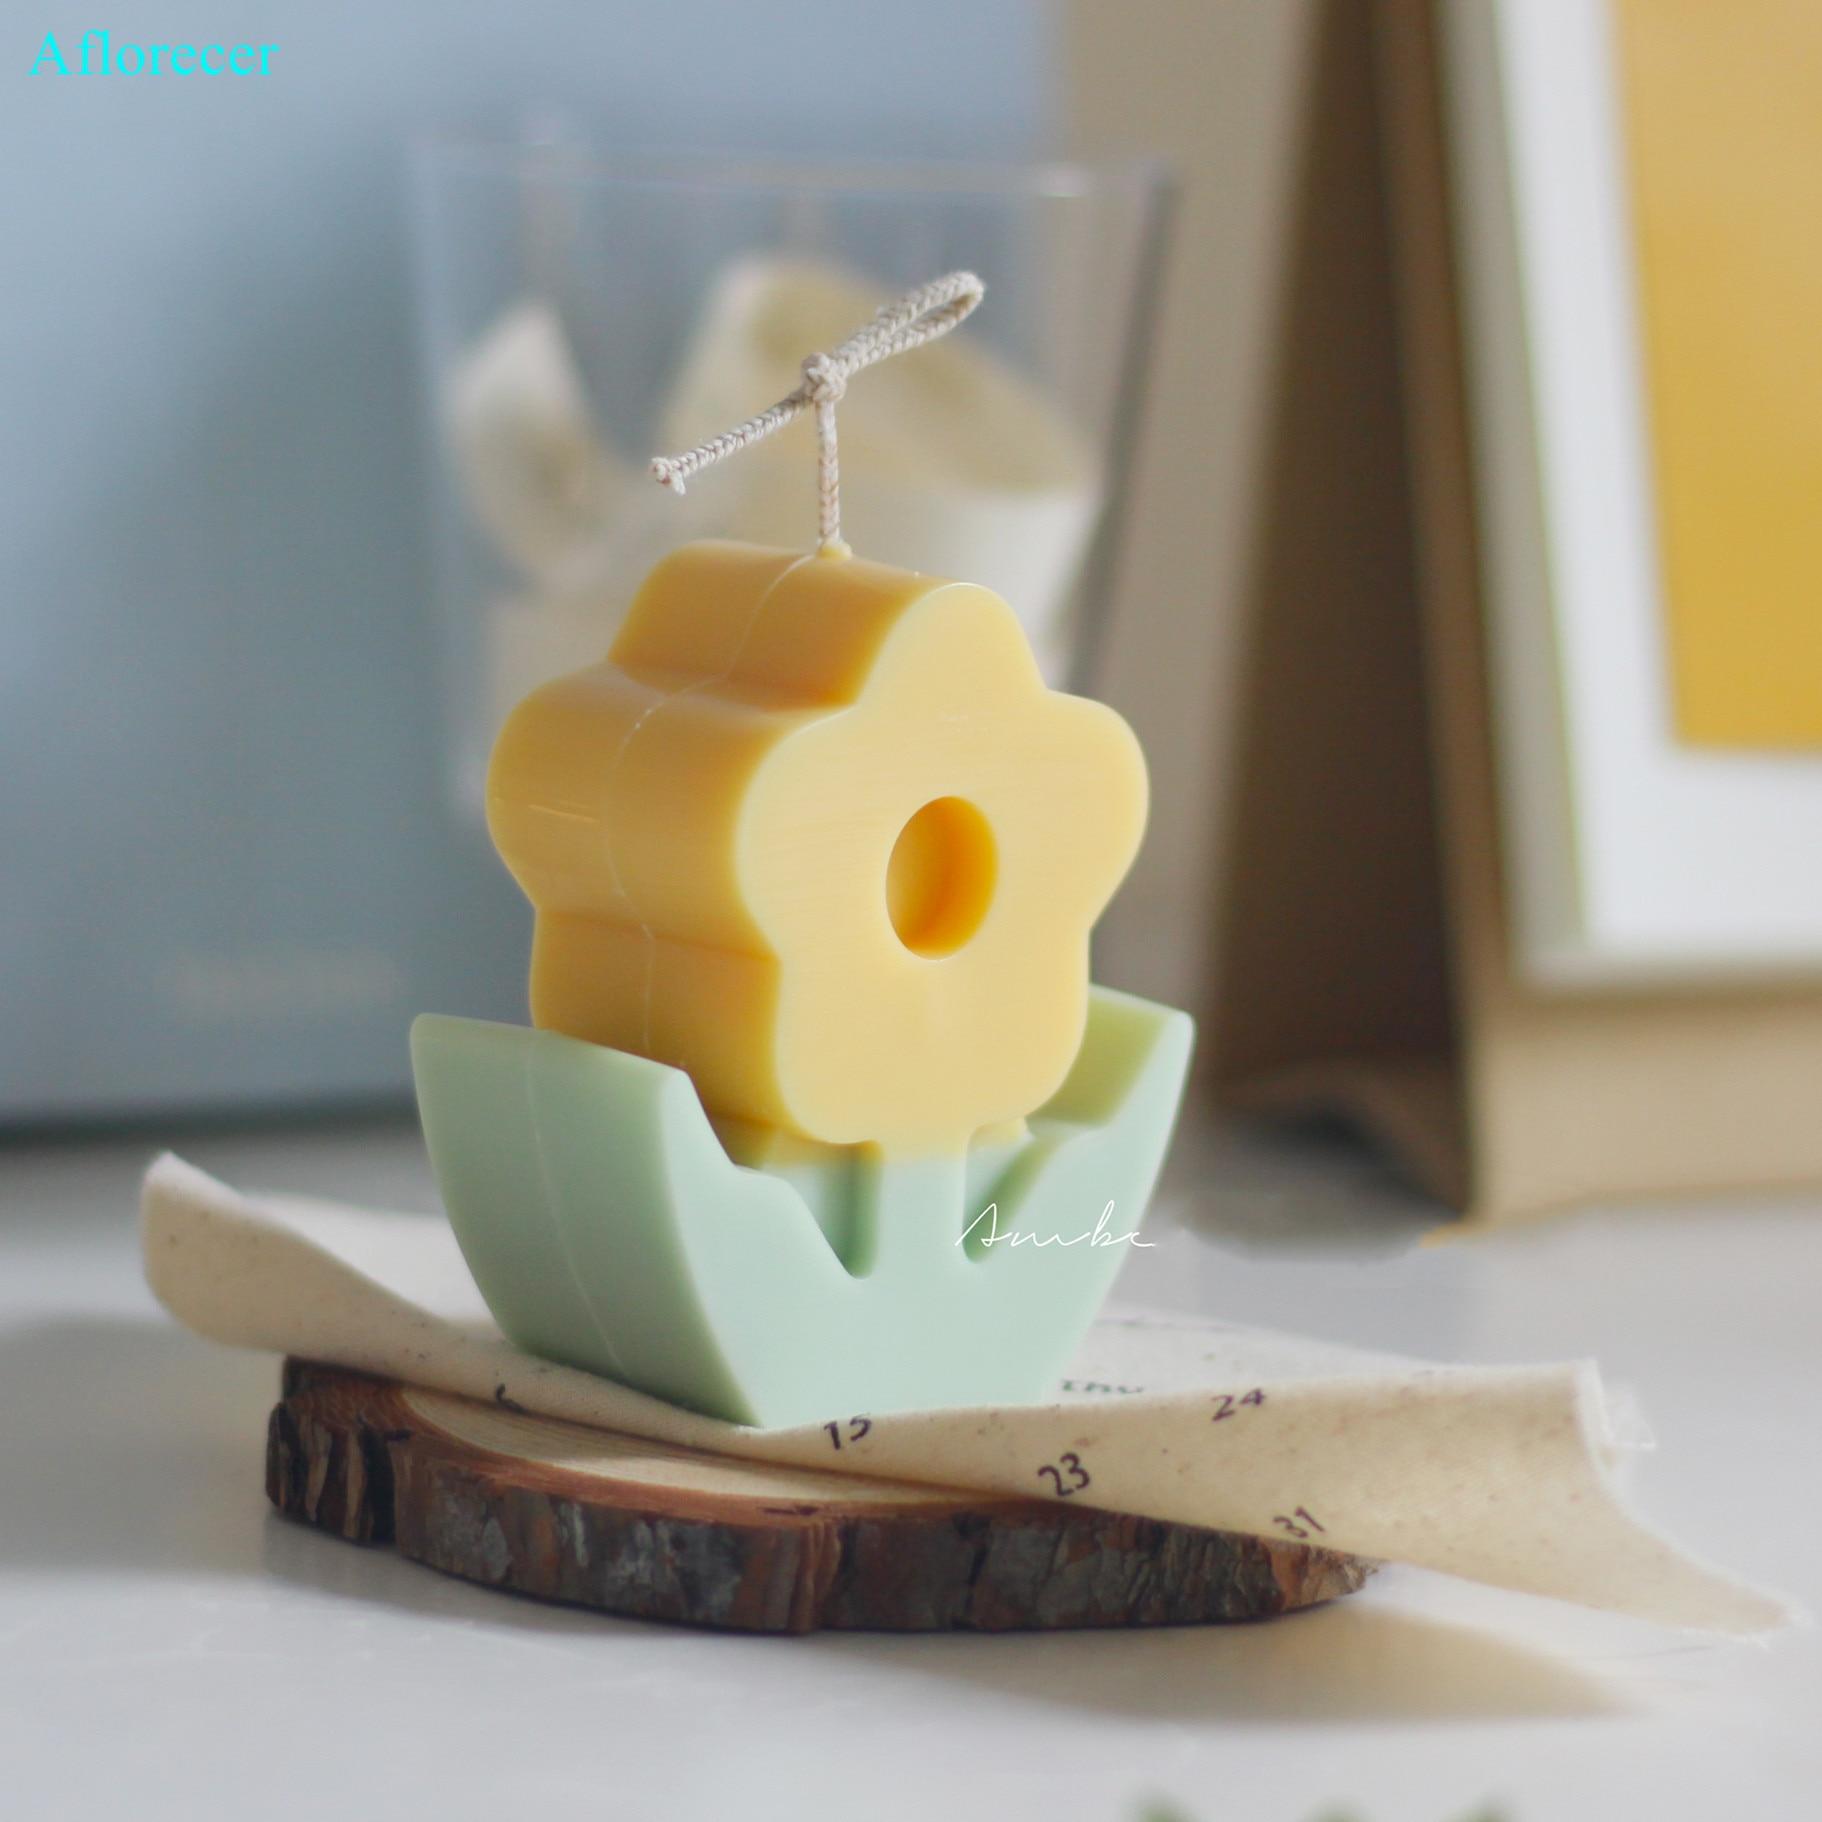 3d Blume kerze formen Koreanische design Acryl kerze form Duft kerze, der Soja wachs kerze form